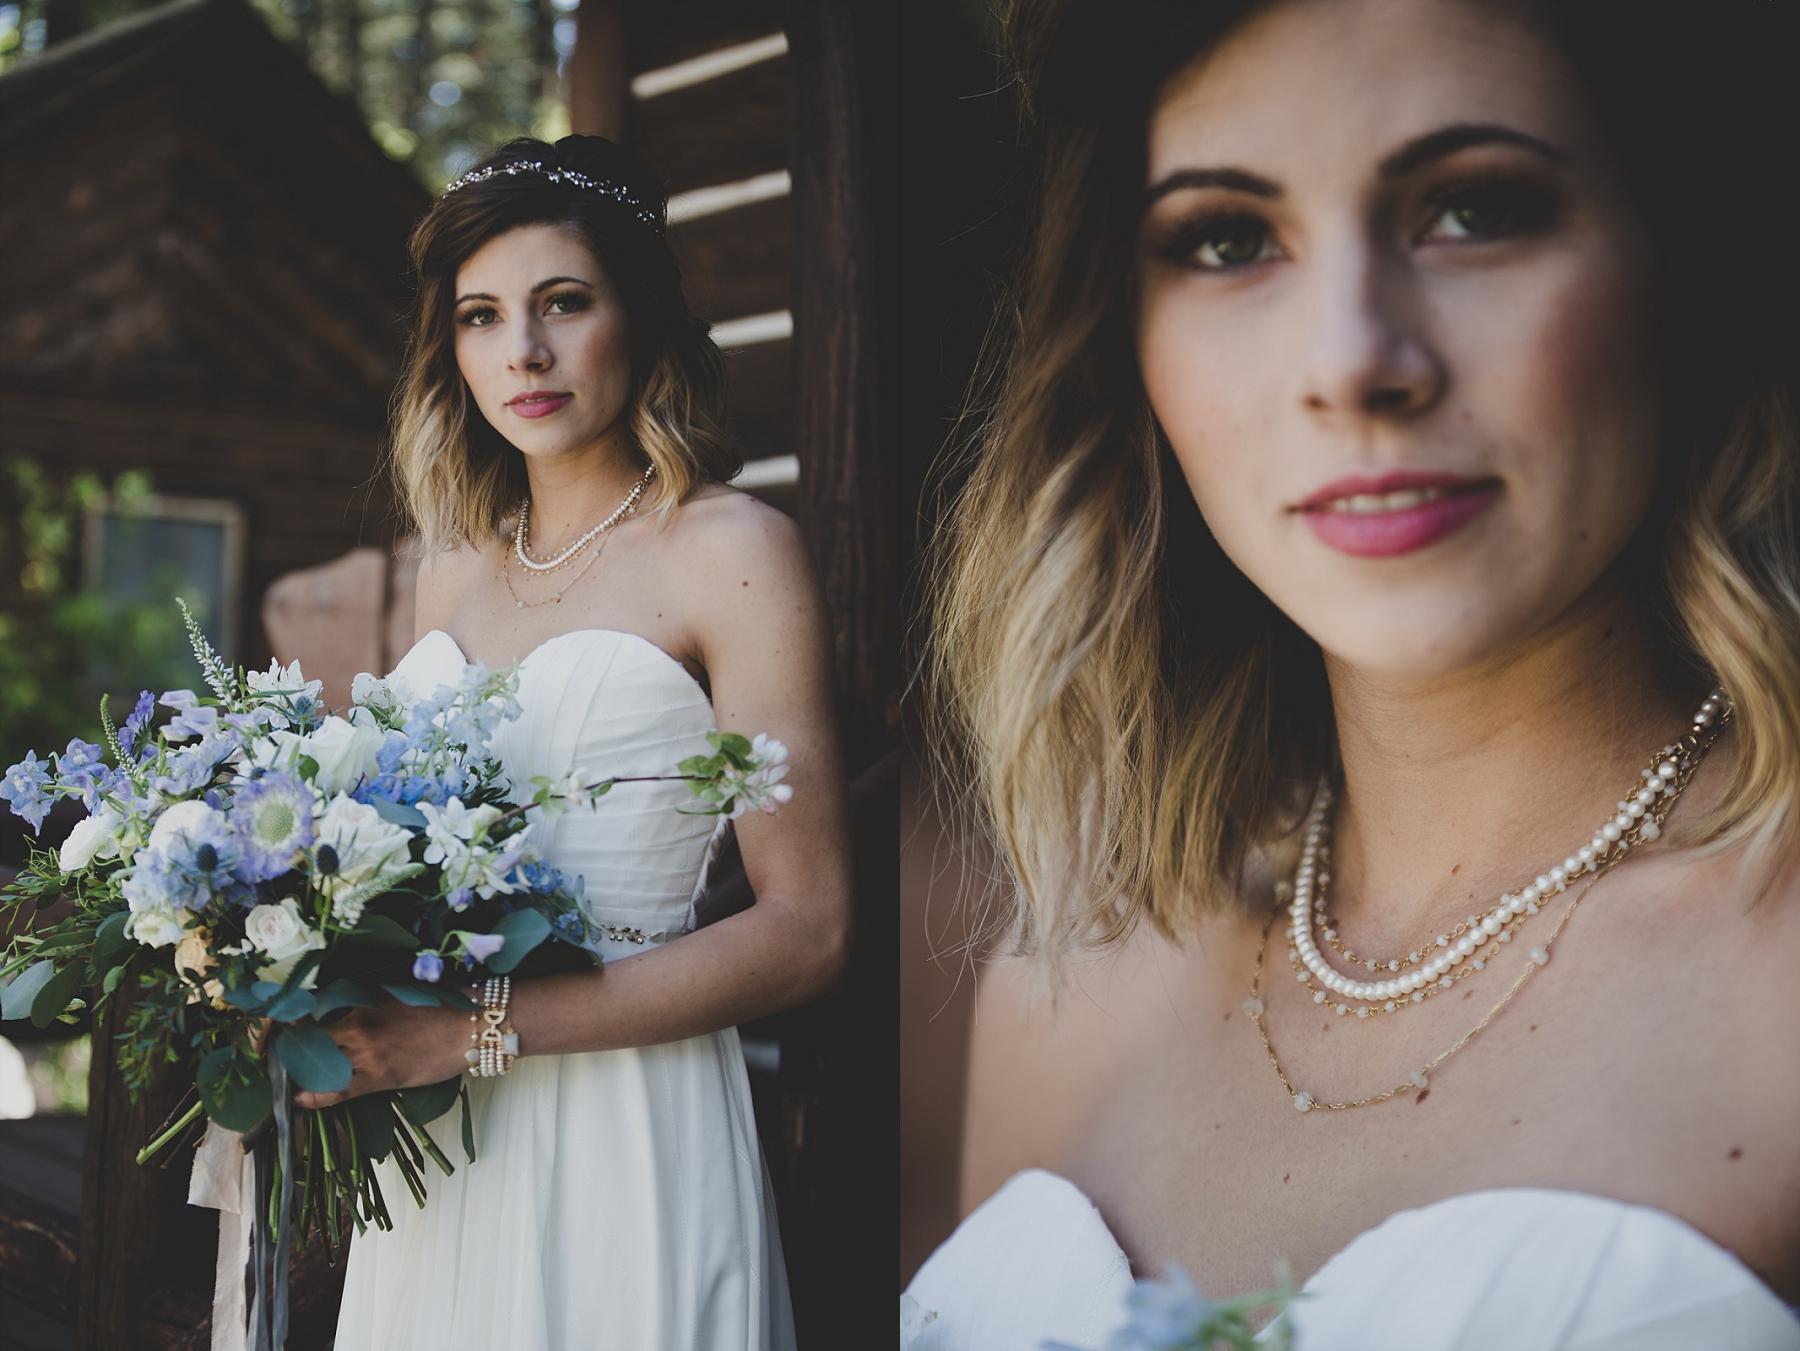 Jennifer_Mooney_Photo_Flathead_Lake_Lodge_Styled_Shoot_00017 - Copy.jpg